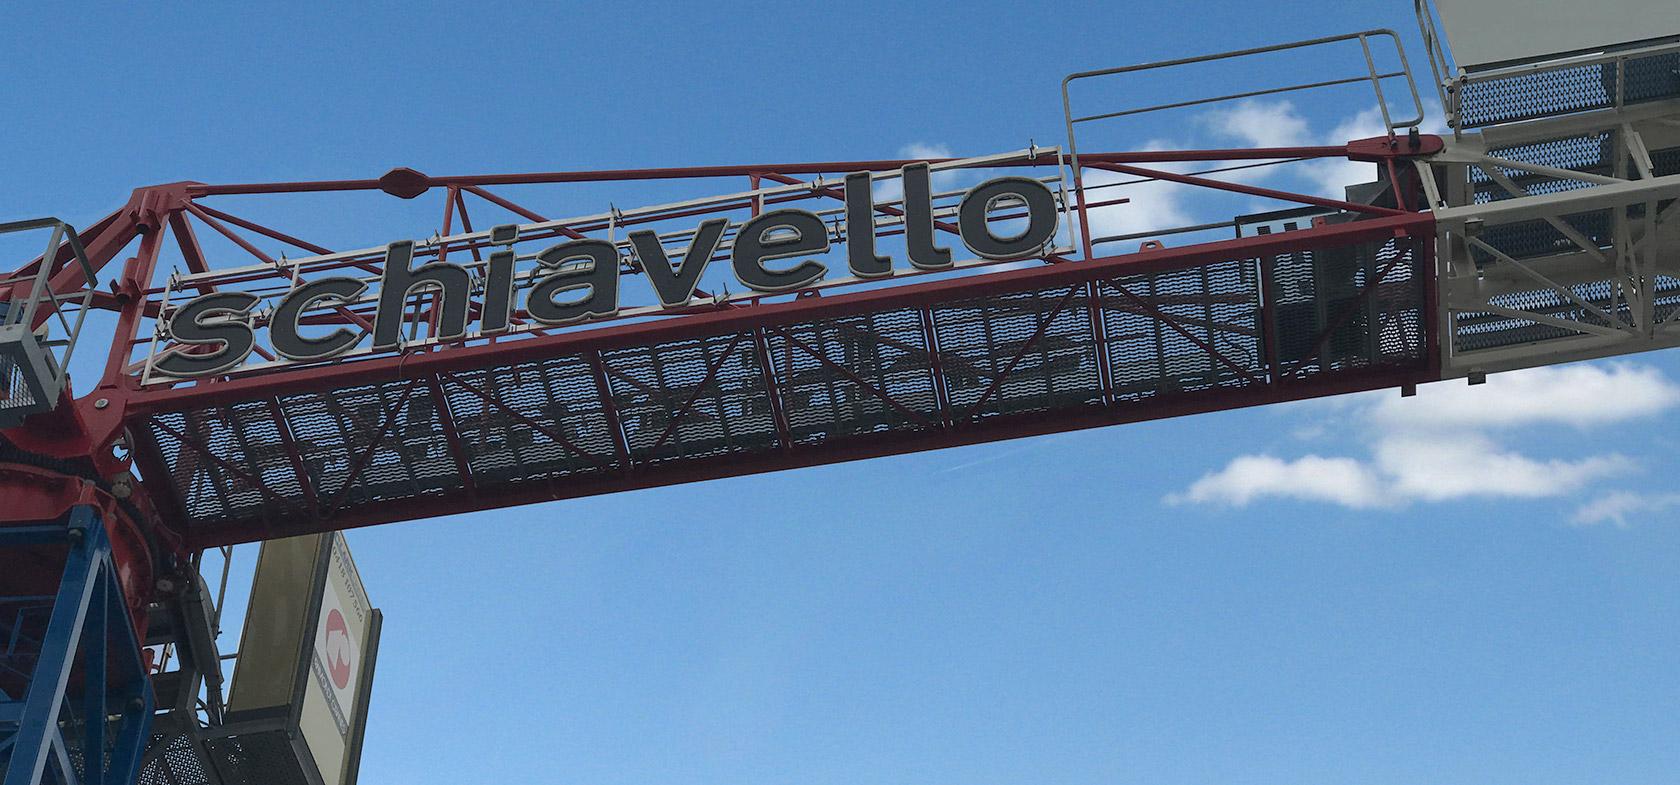 Schiavello Construction Crane Signage in Blue Sky